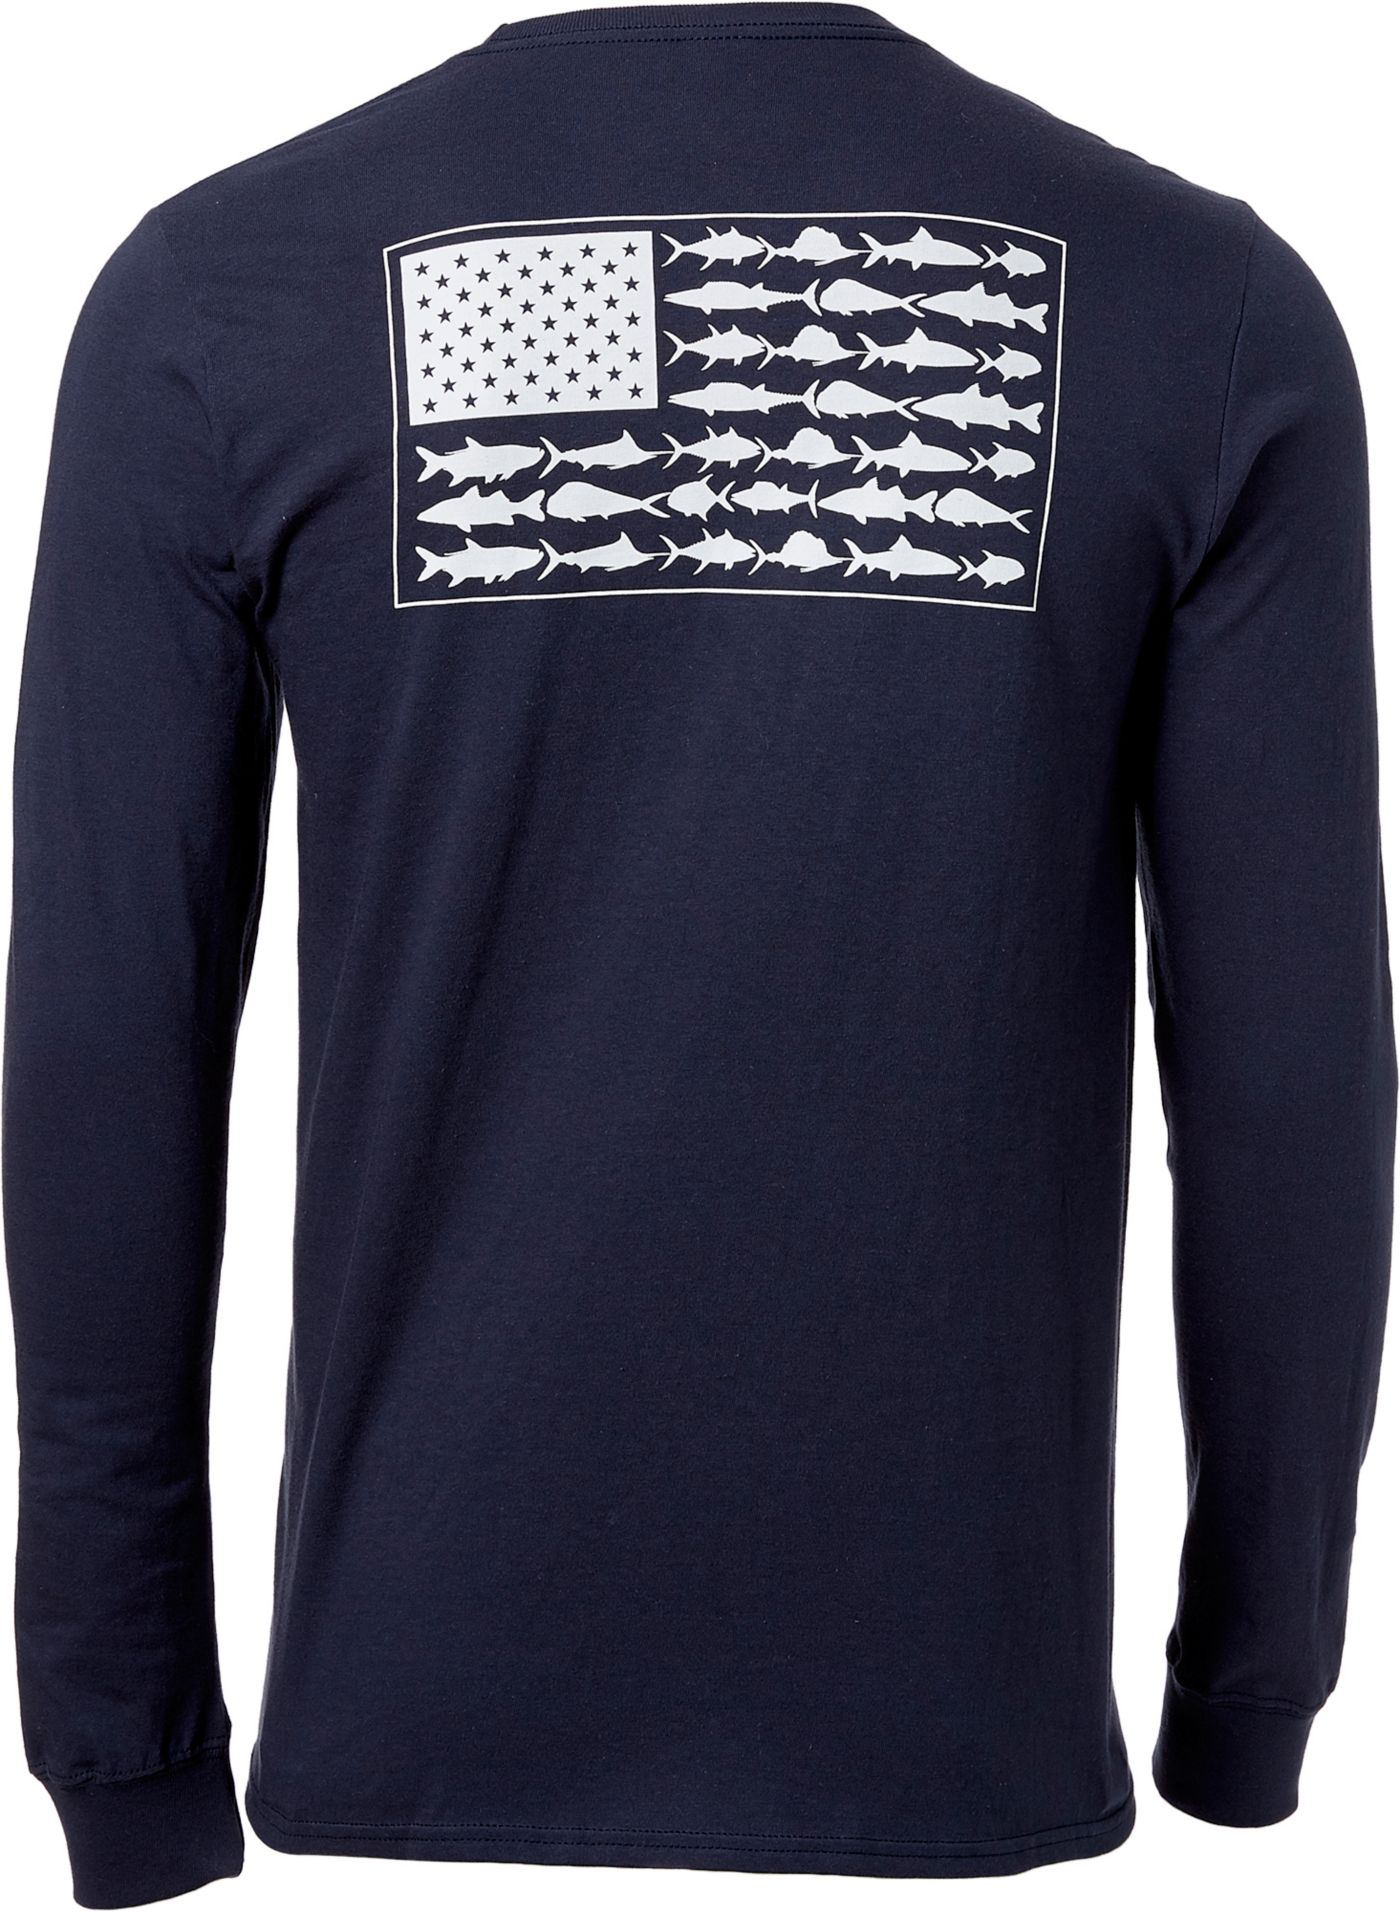 Columbia Men's PFG Americana Saltwater Fish Flag Long Sleeve Shirt